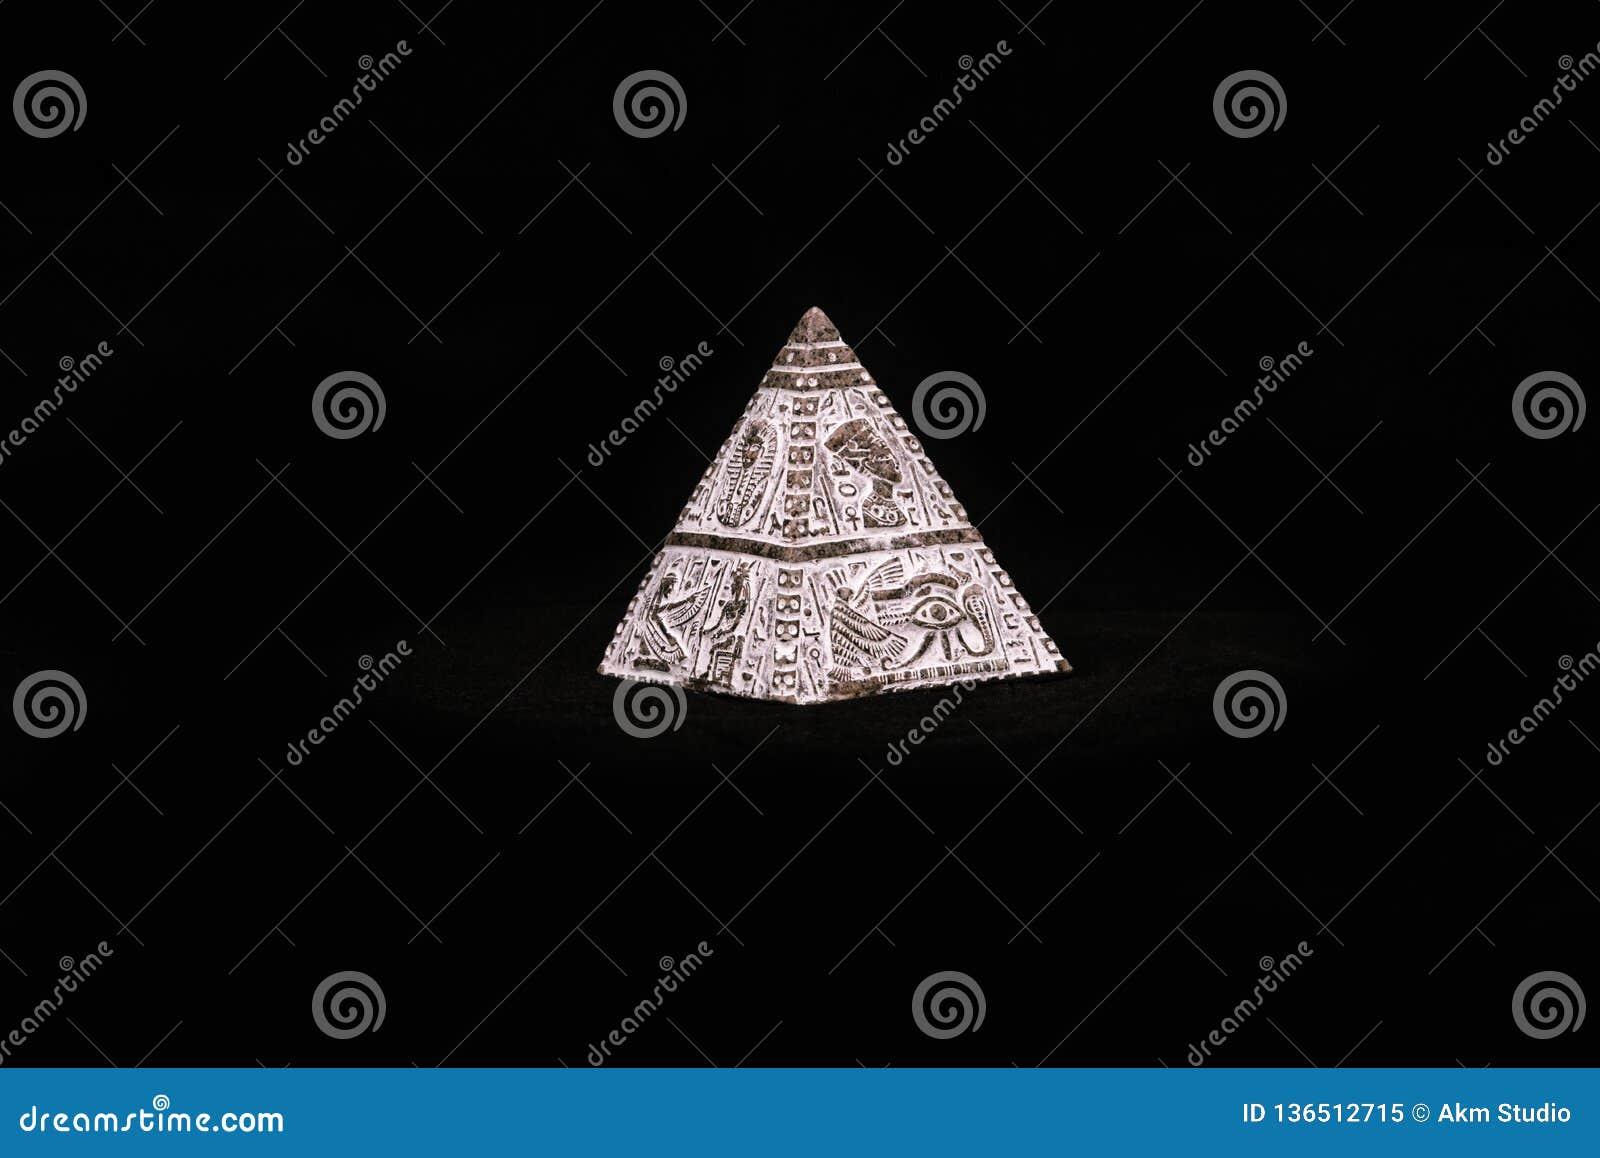 Figure Egyptian pyramid